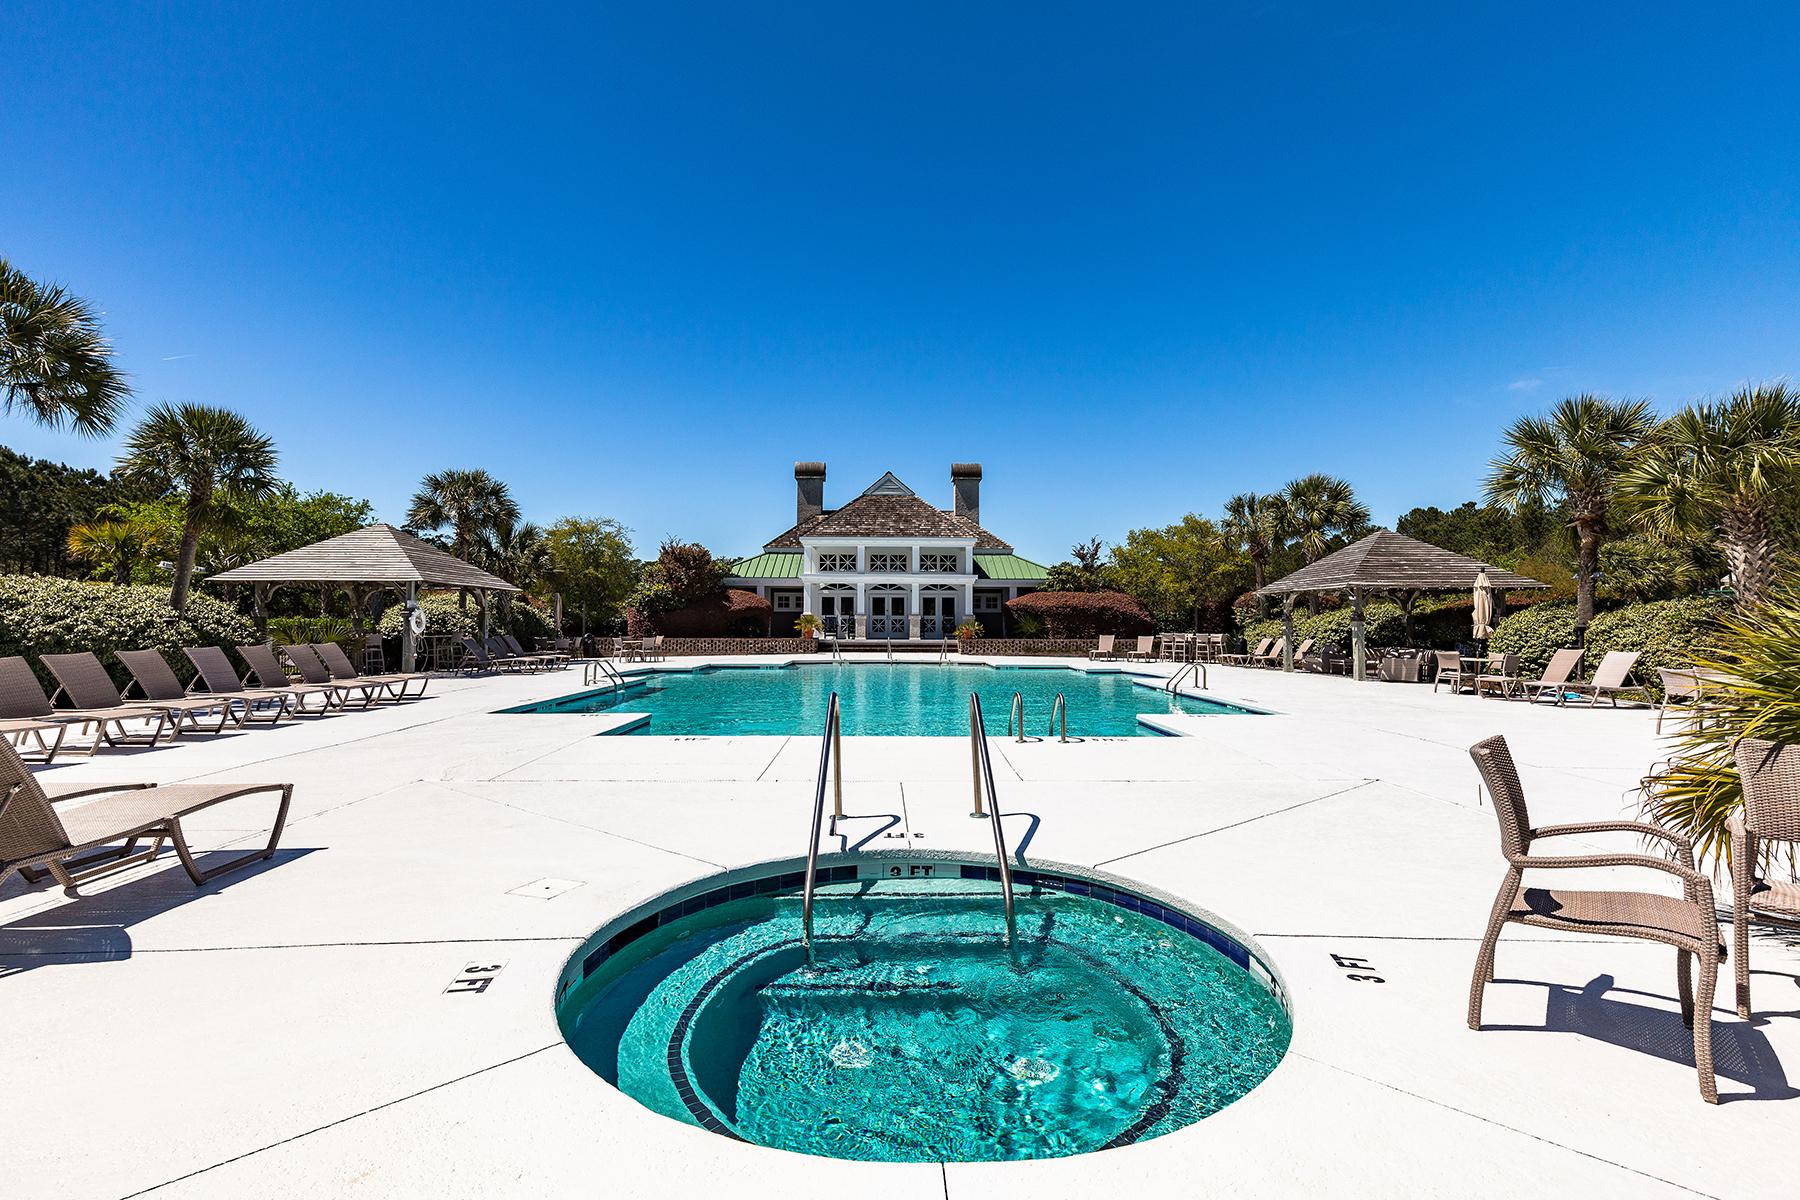 Additional photo for property listing at 727 Beach Bridge Road 727  Beach Bridge Road Pawleys Island, South Carolina 29585 United States